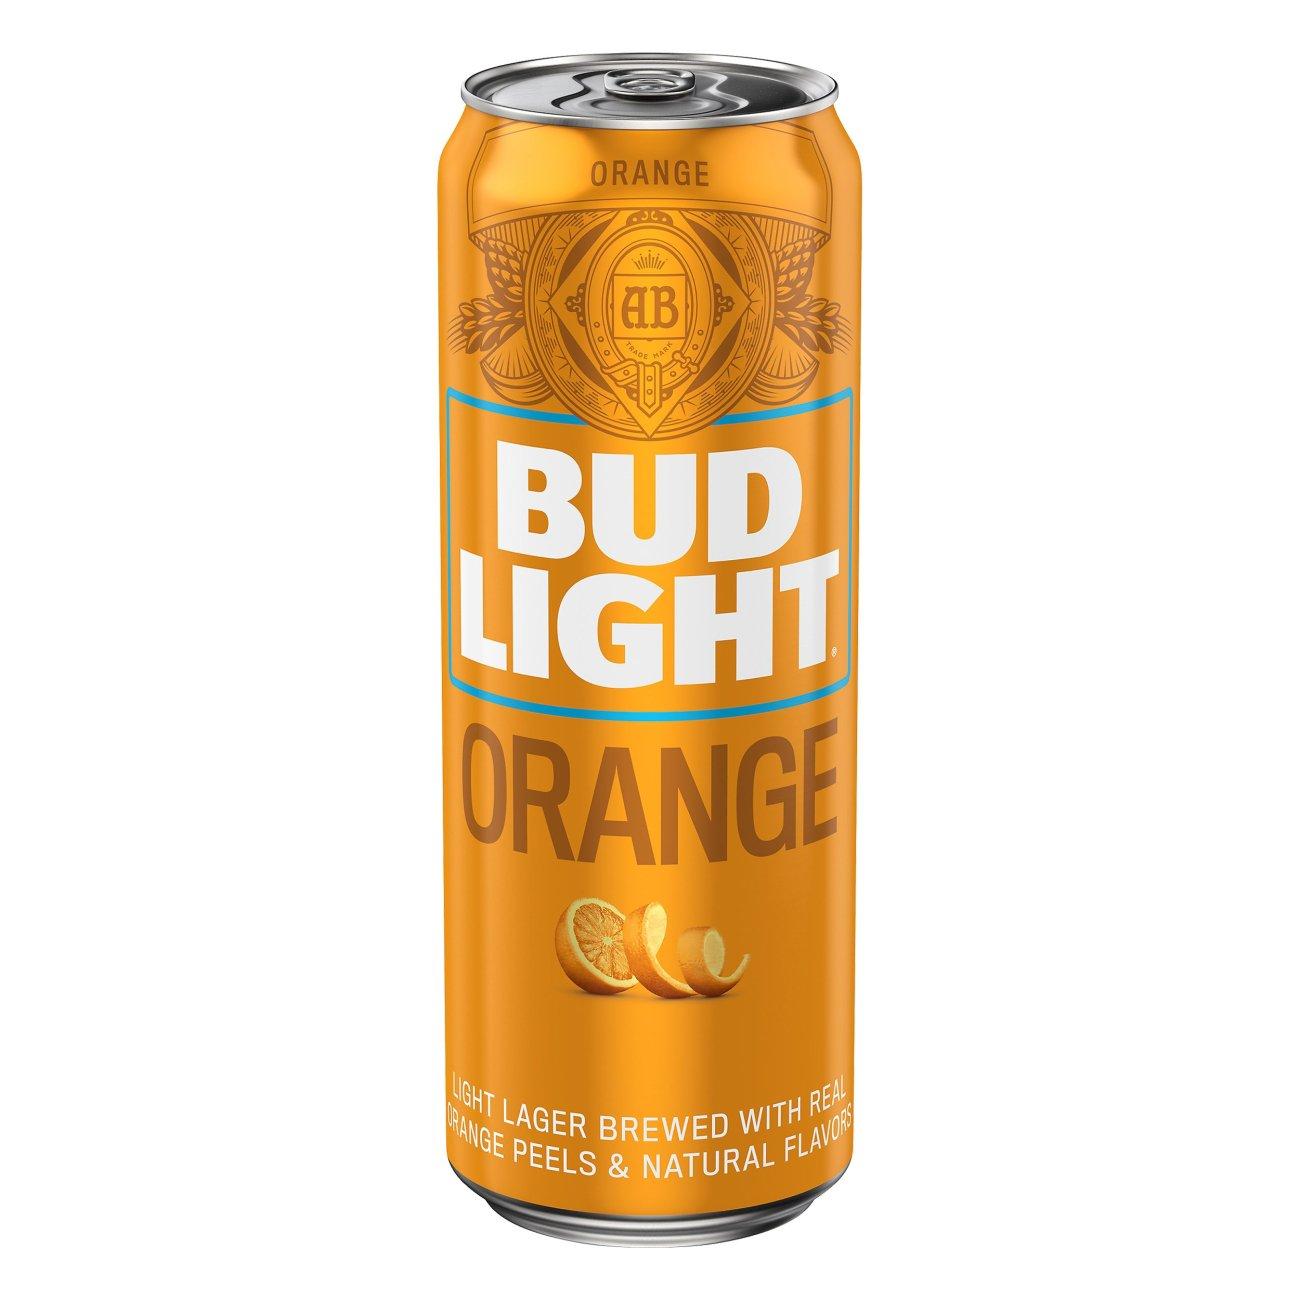 Bud Light Orange U2011 Shop Beer At Hu2011Eu2011B